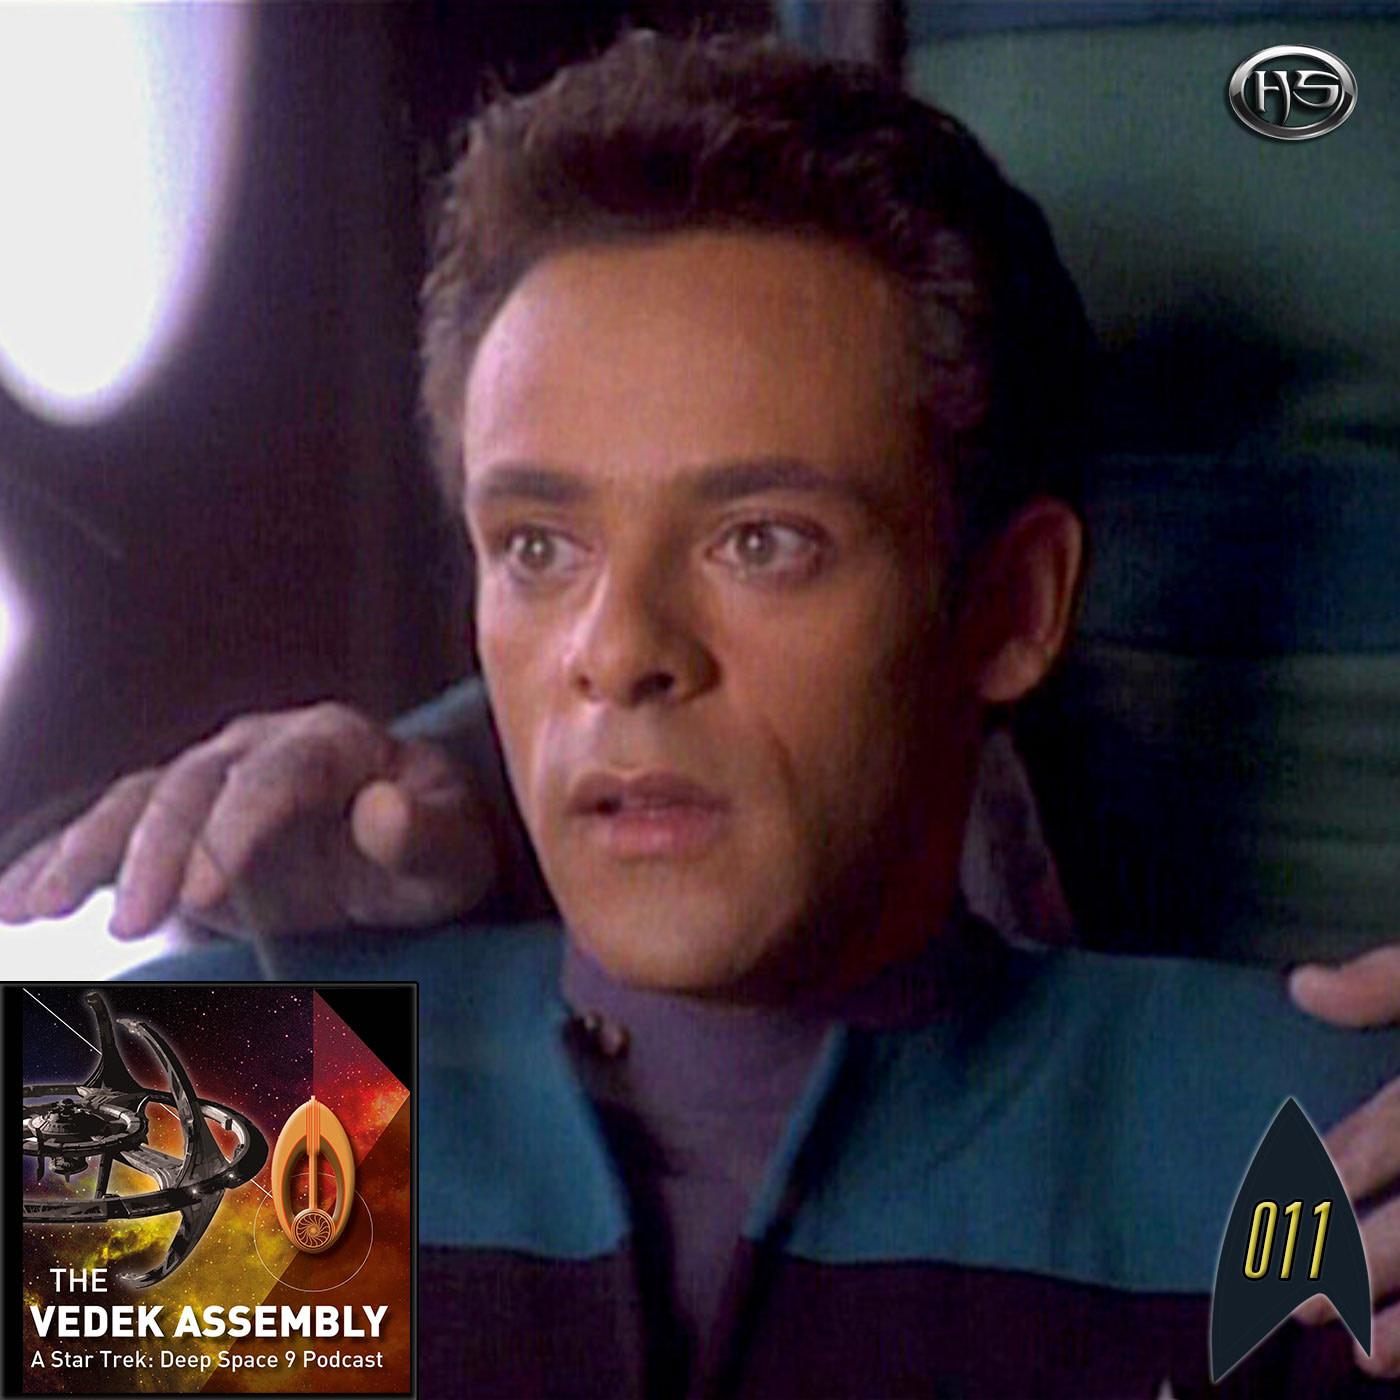 The Vedek Assembly Episode 11